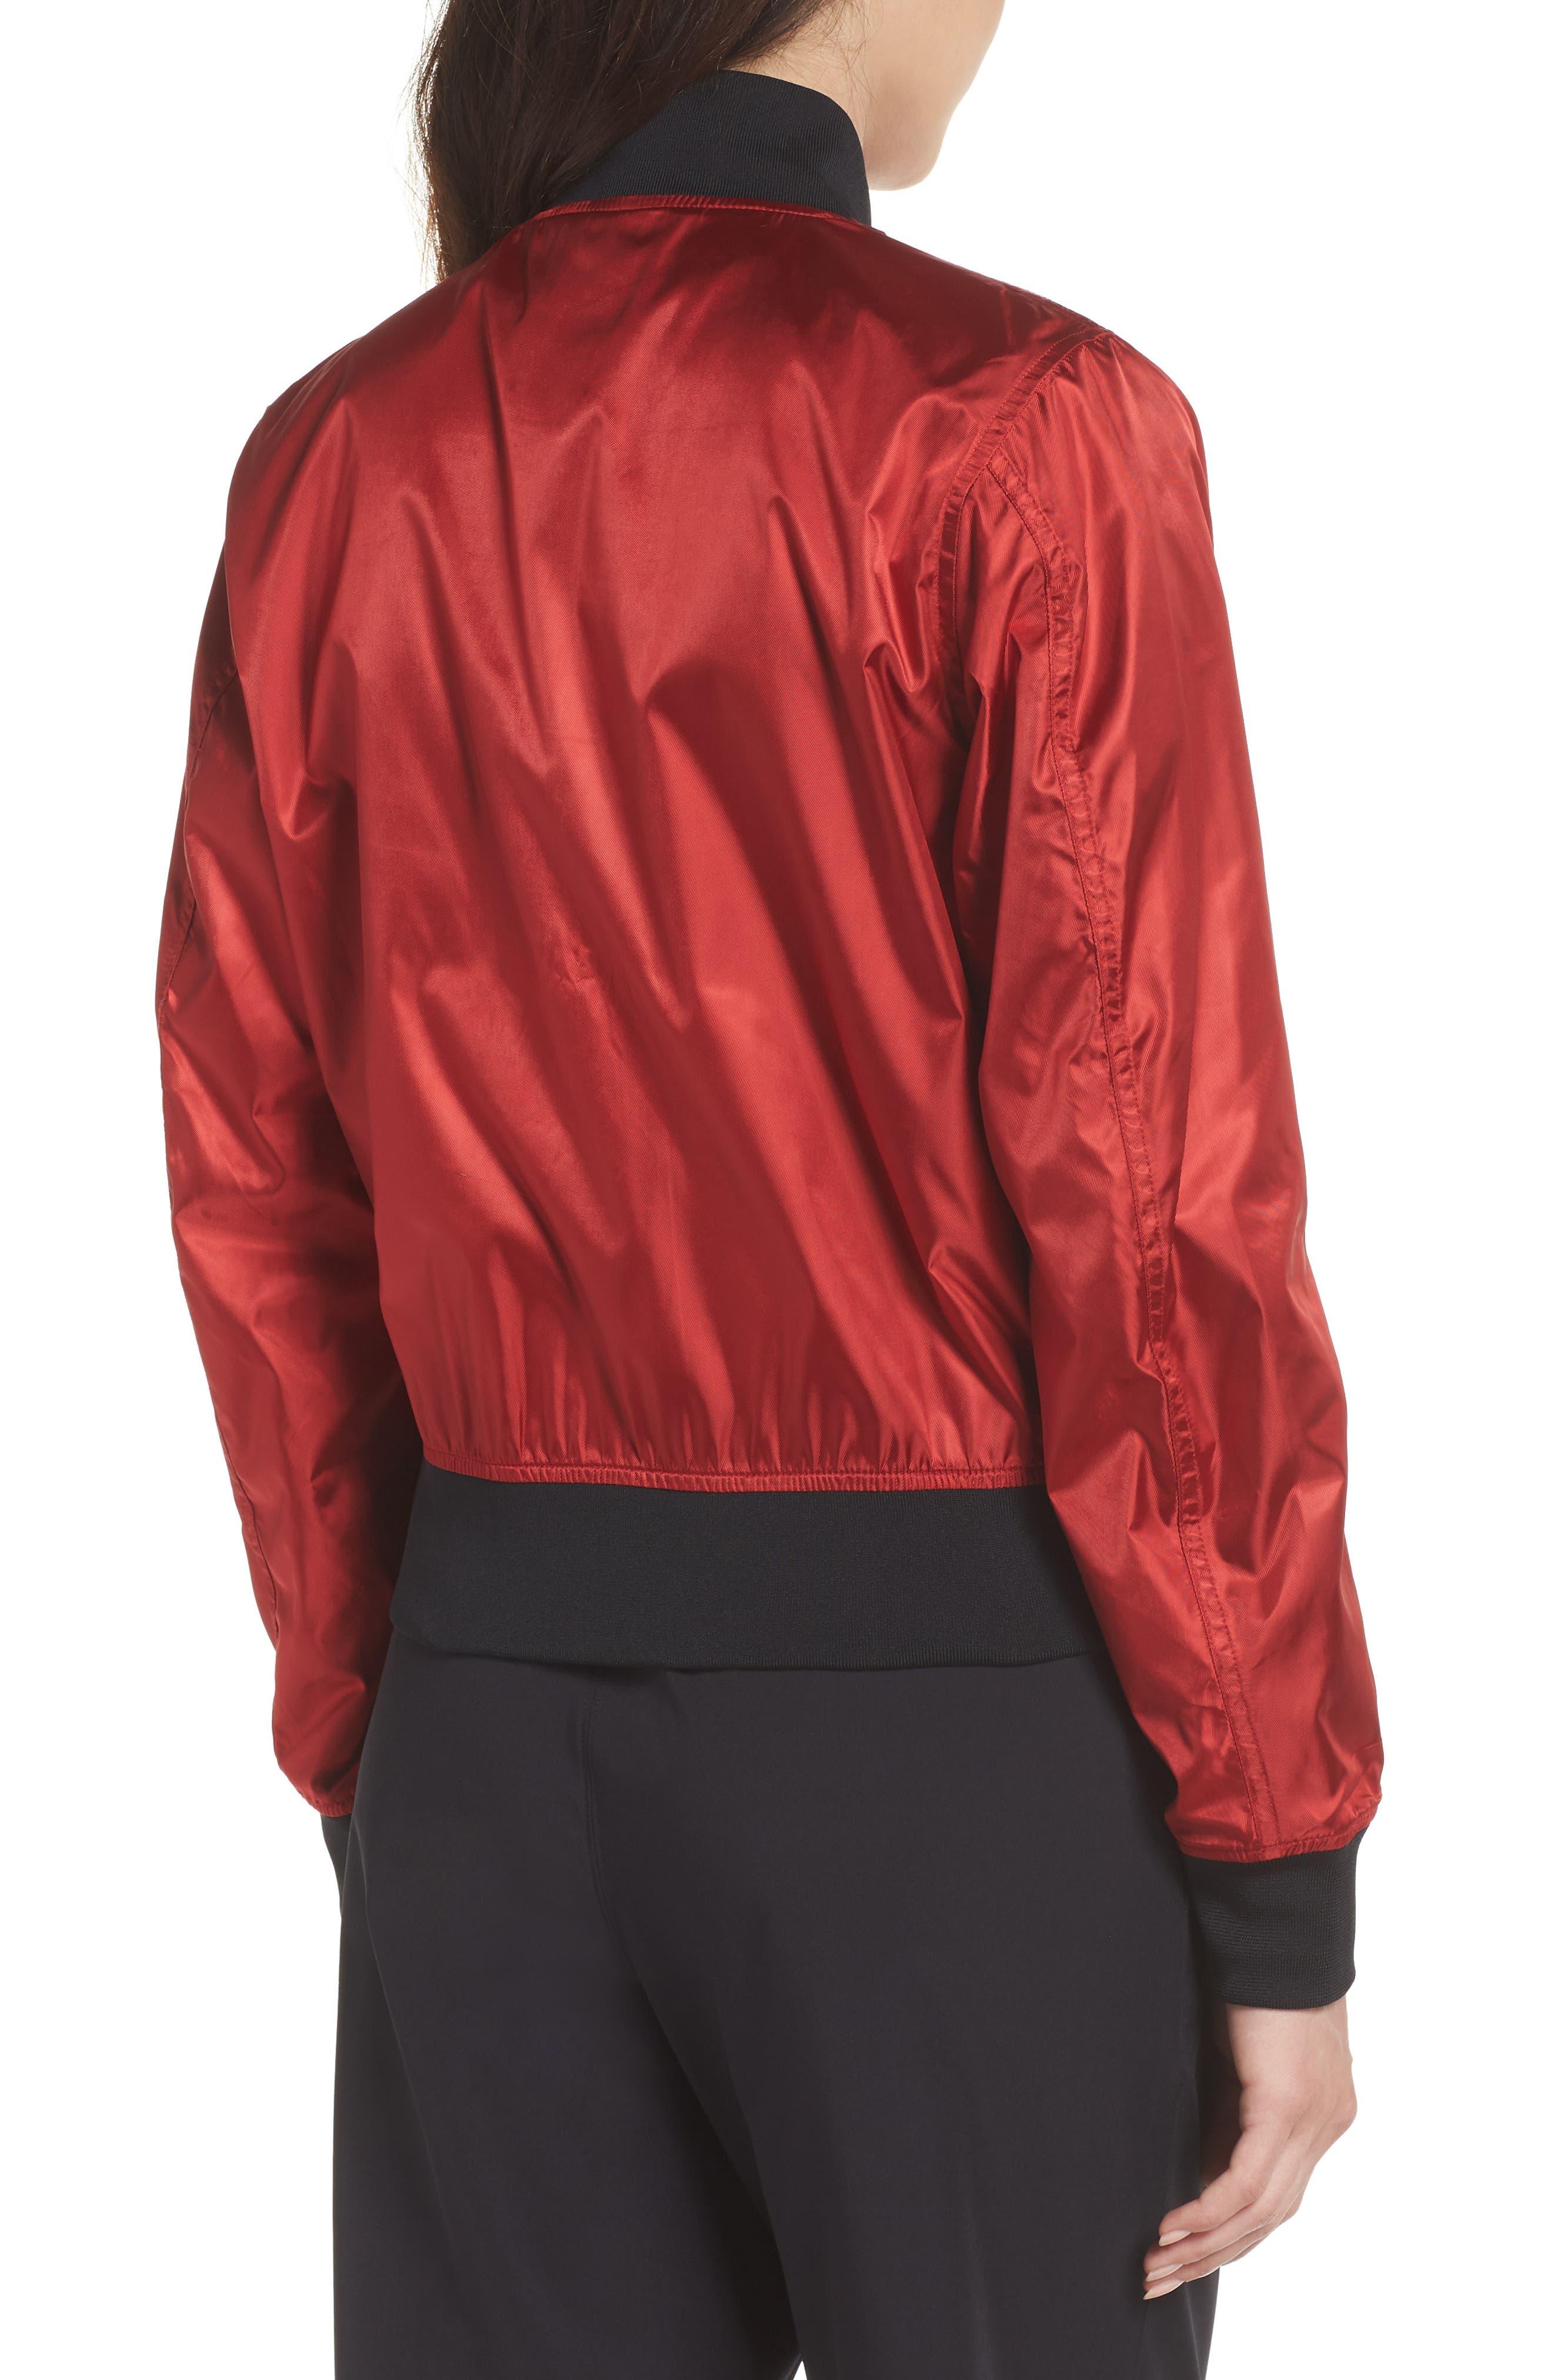 NikeLab Collection Women's Satin Bomber Jacket,                             Alternate thumbnail 2, color,                             Gym Red/ Black